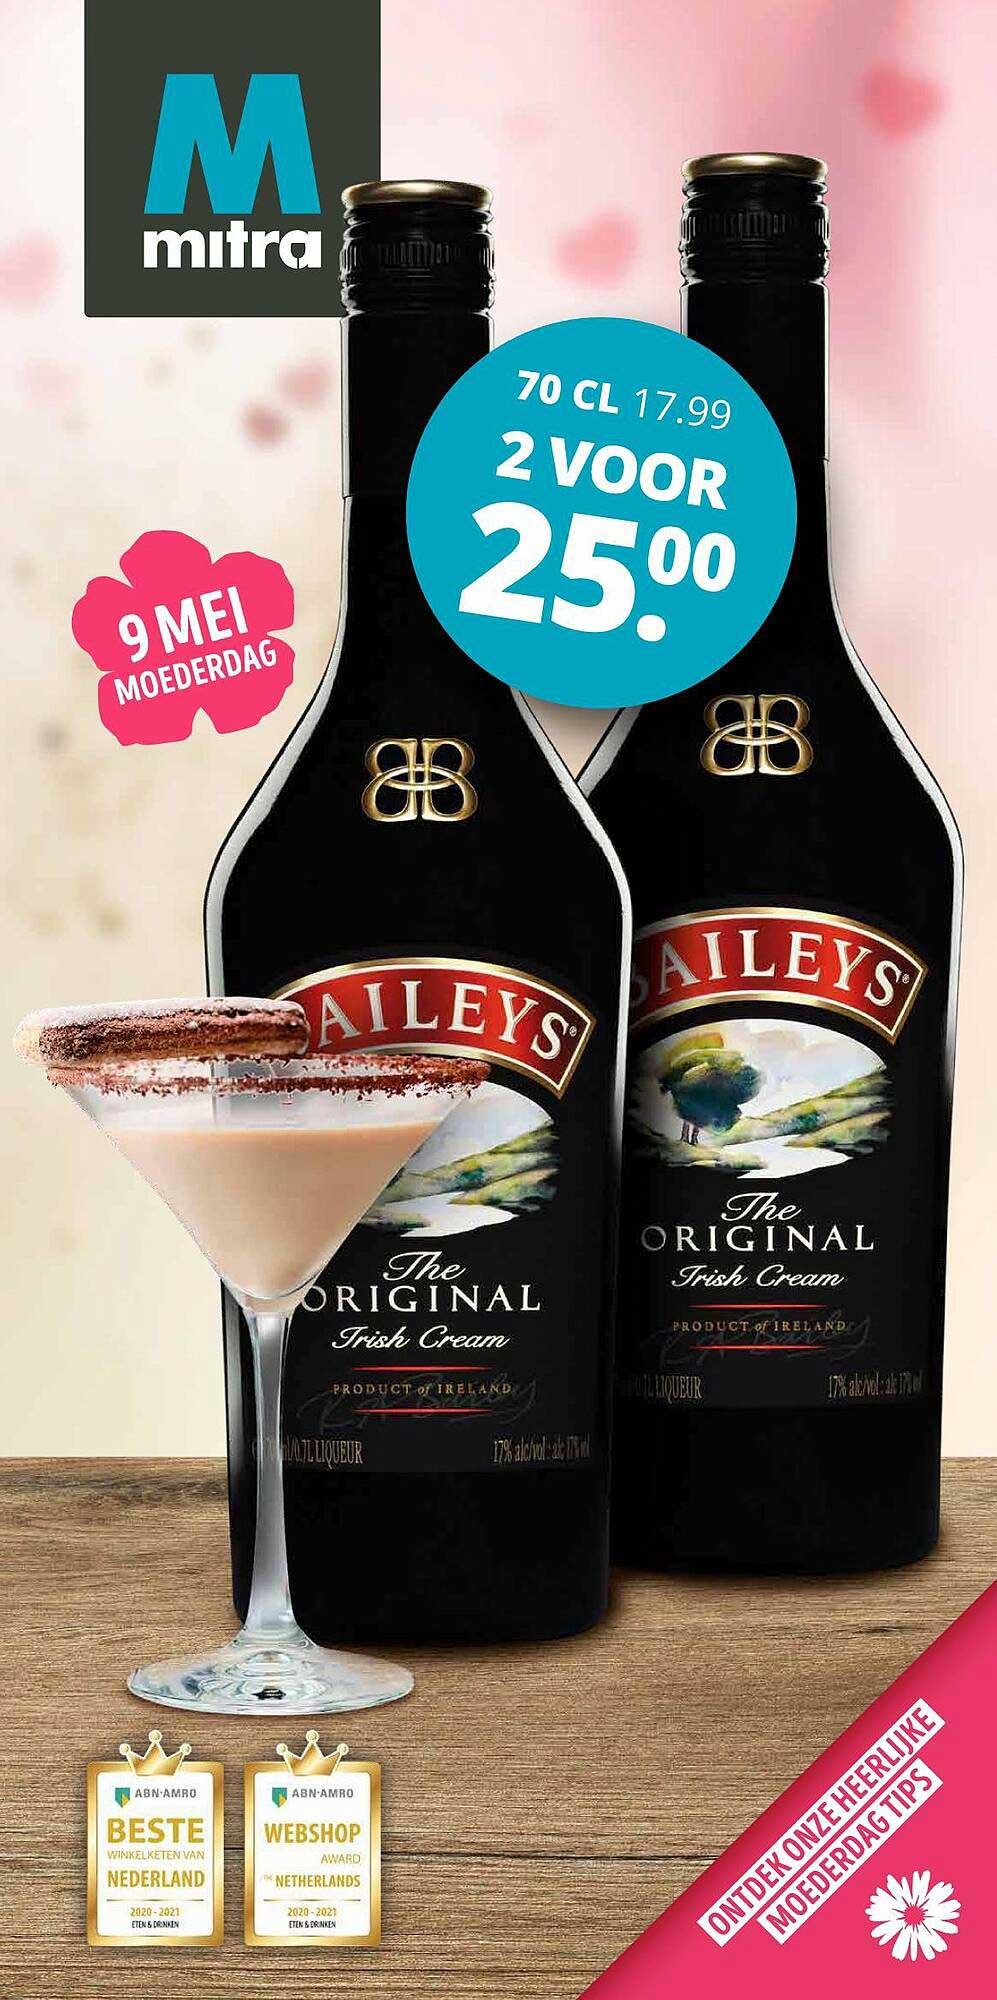 Mitra Baileys The Original Irish Cream